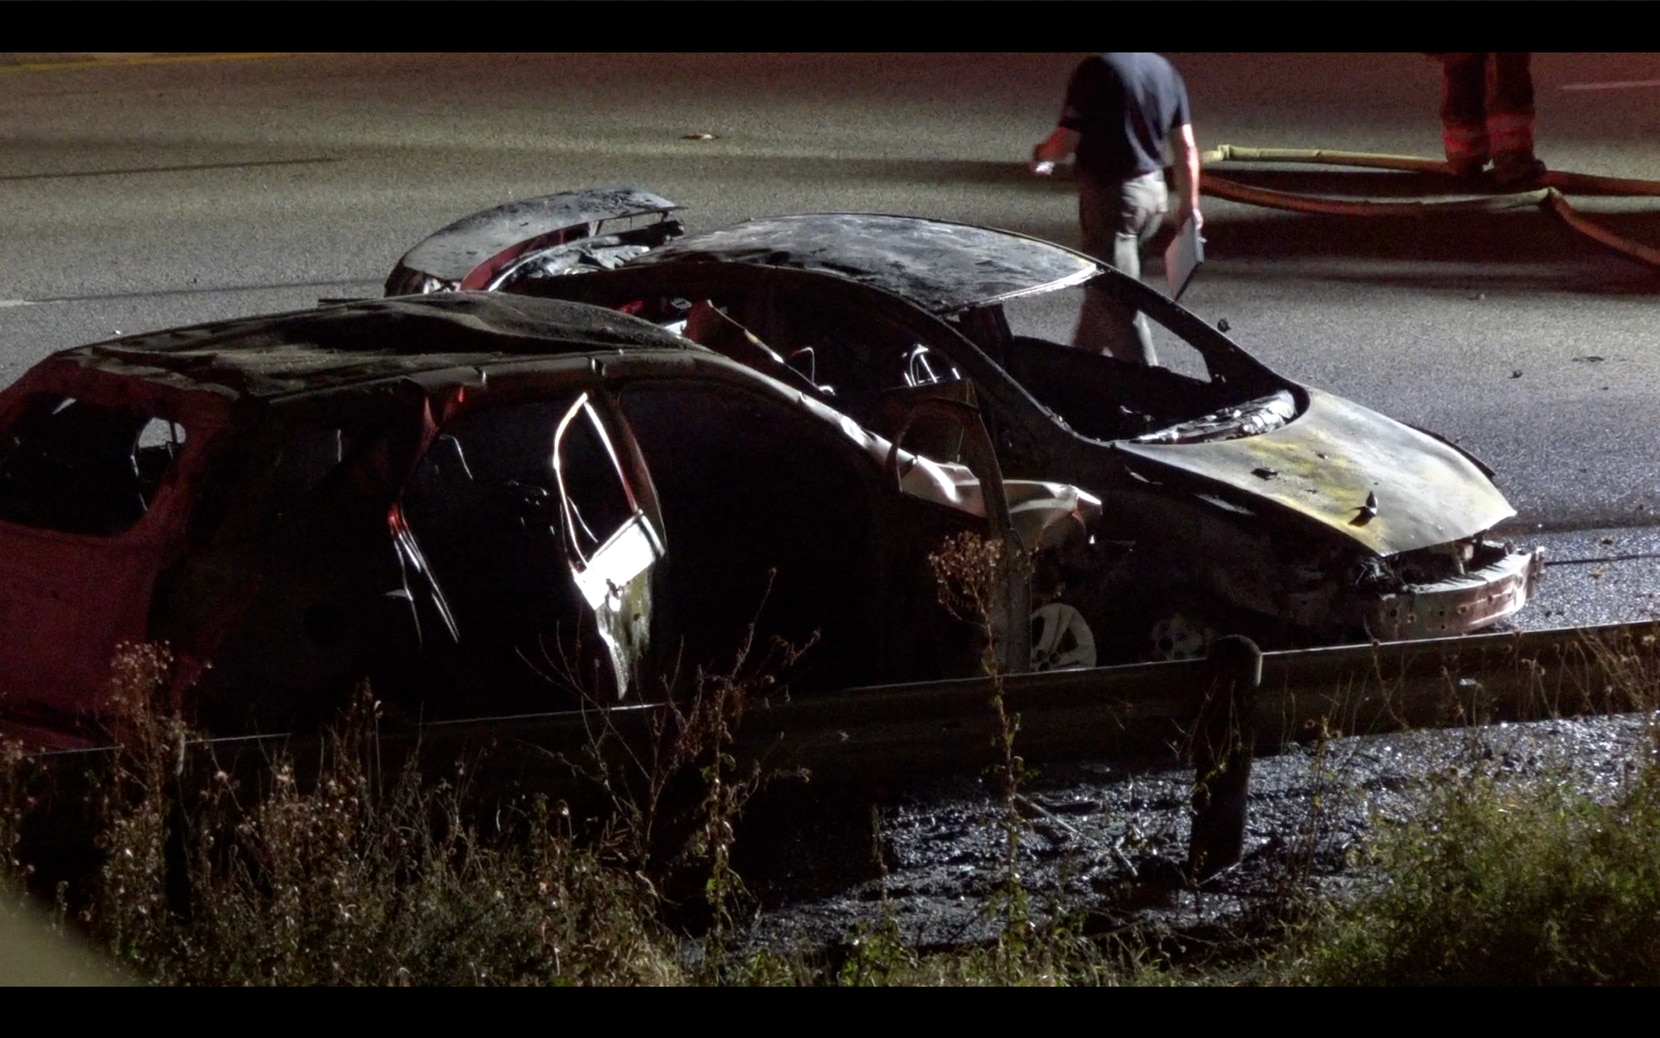 2 victims identified in 'horrific' I-20 crash with drunken